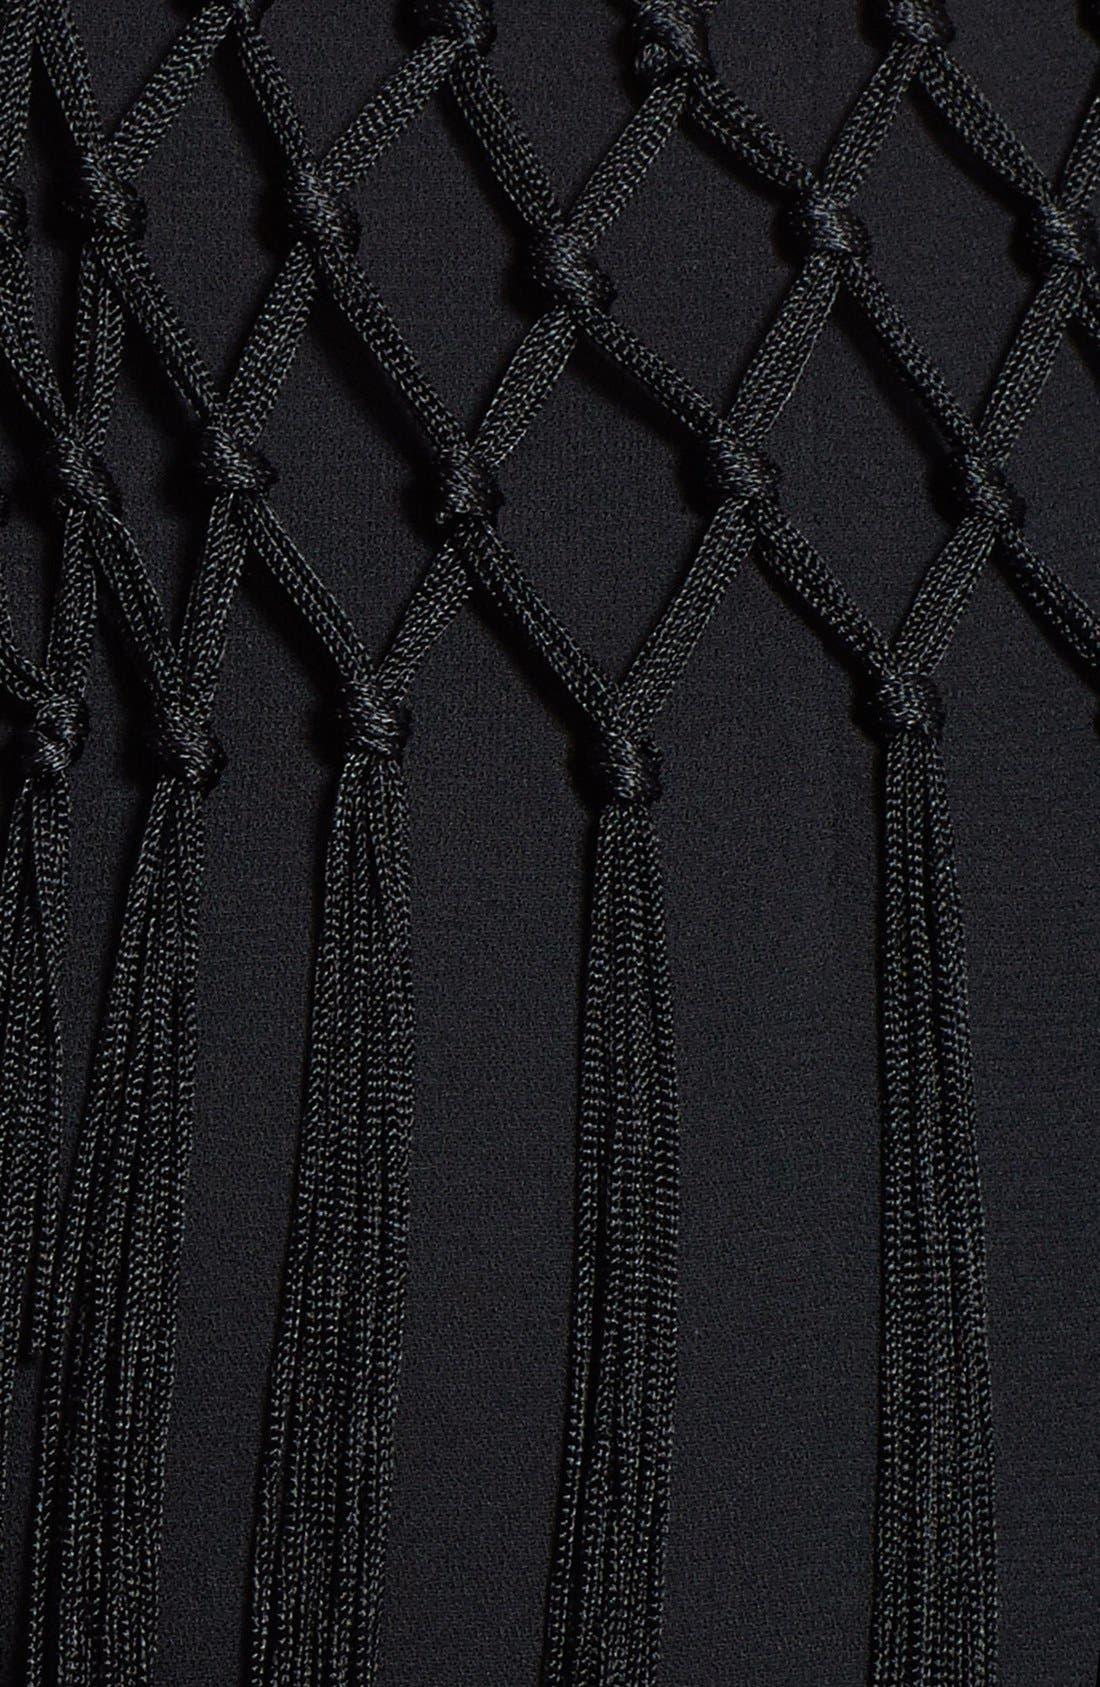 Alternate Image 3  - ASTR Fringe Overlay Shorts